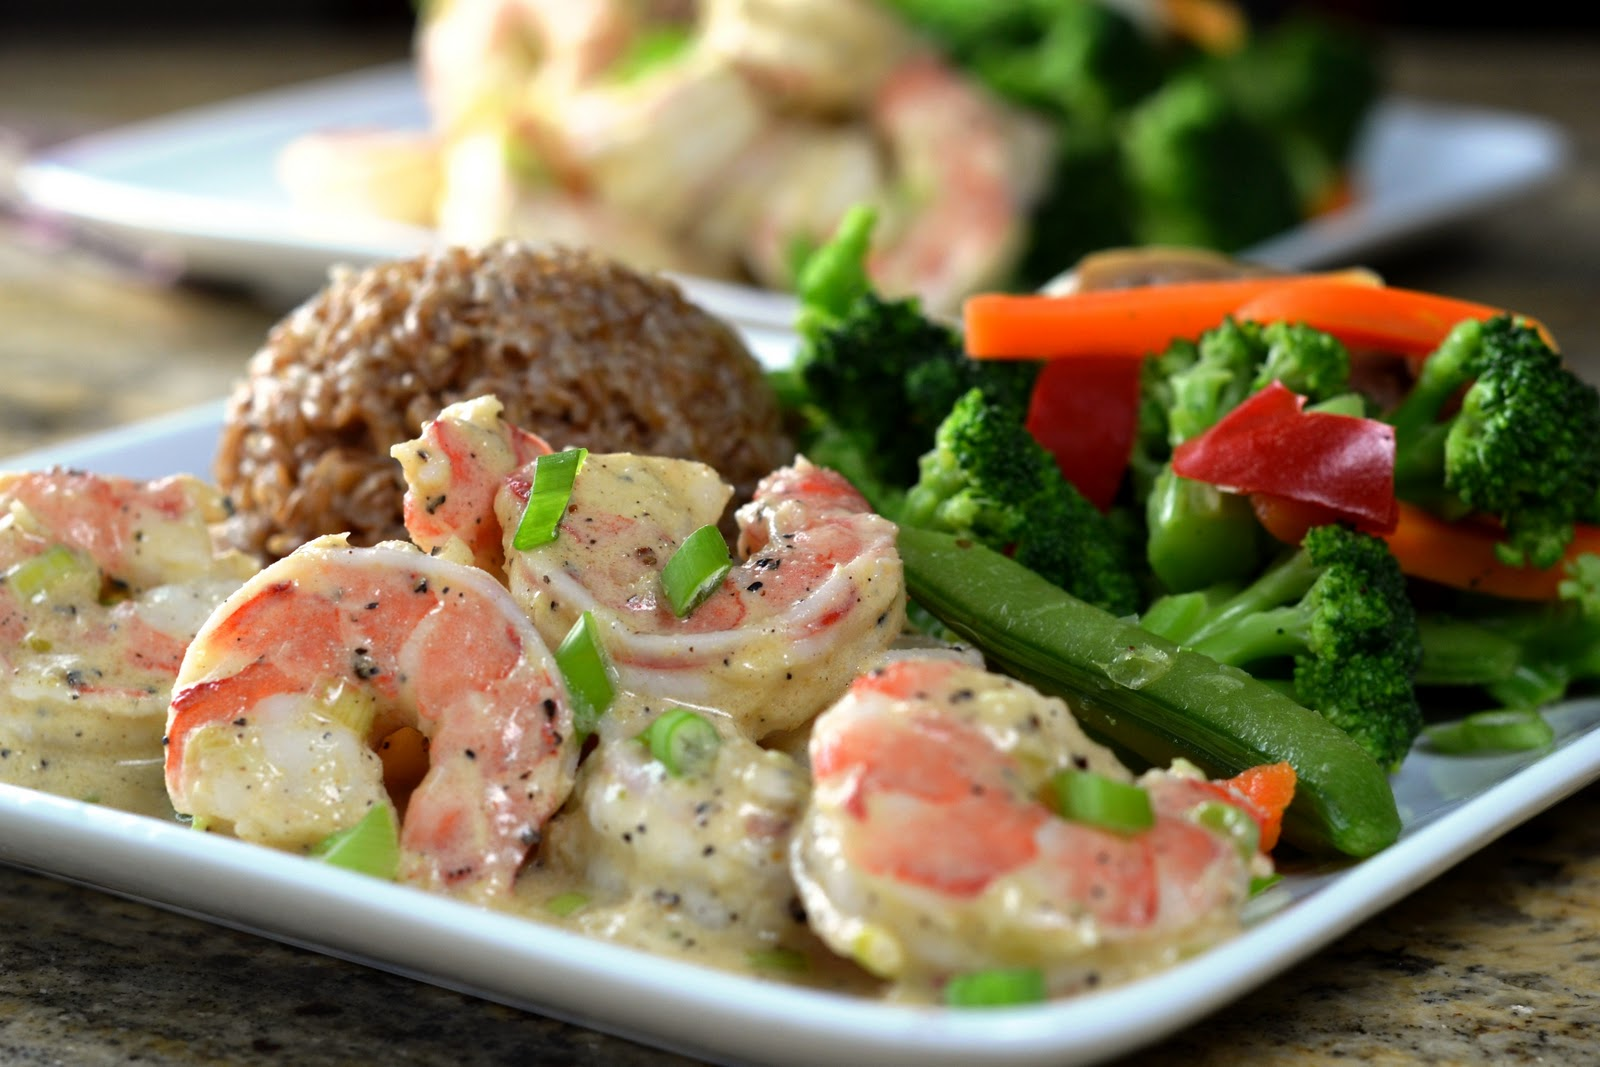 Shrimp Salad Recipe With Horseradish